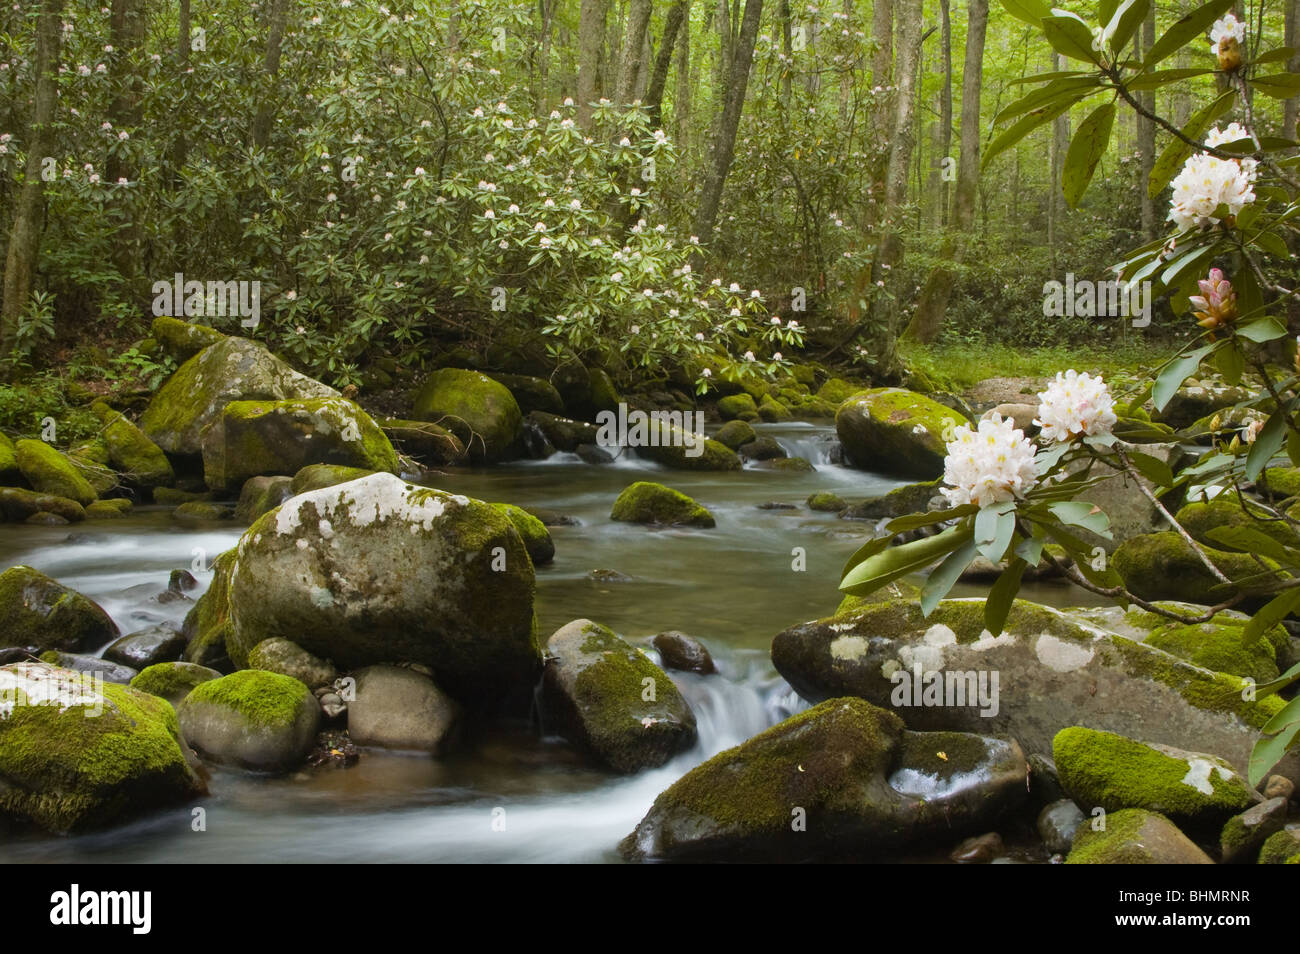 Rushing mountain stream, Great Smoky Mountains National Park, North Carolina - Stock Image